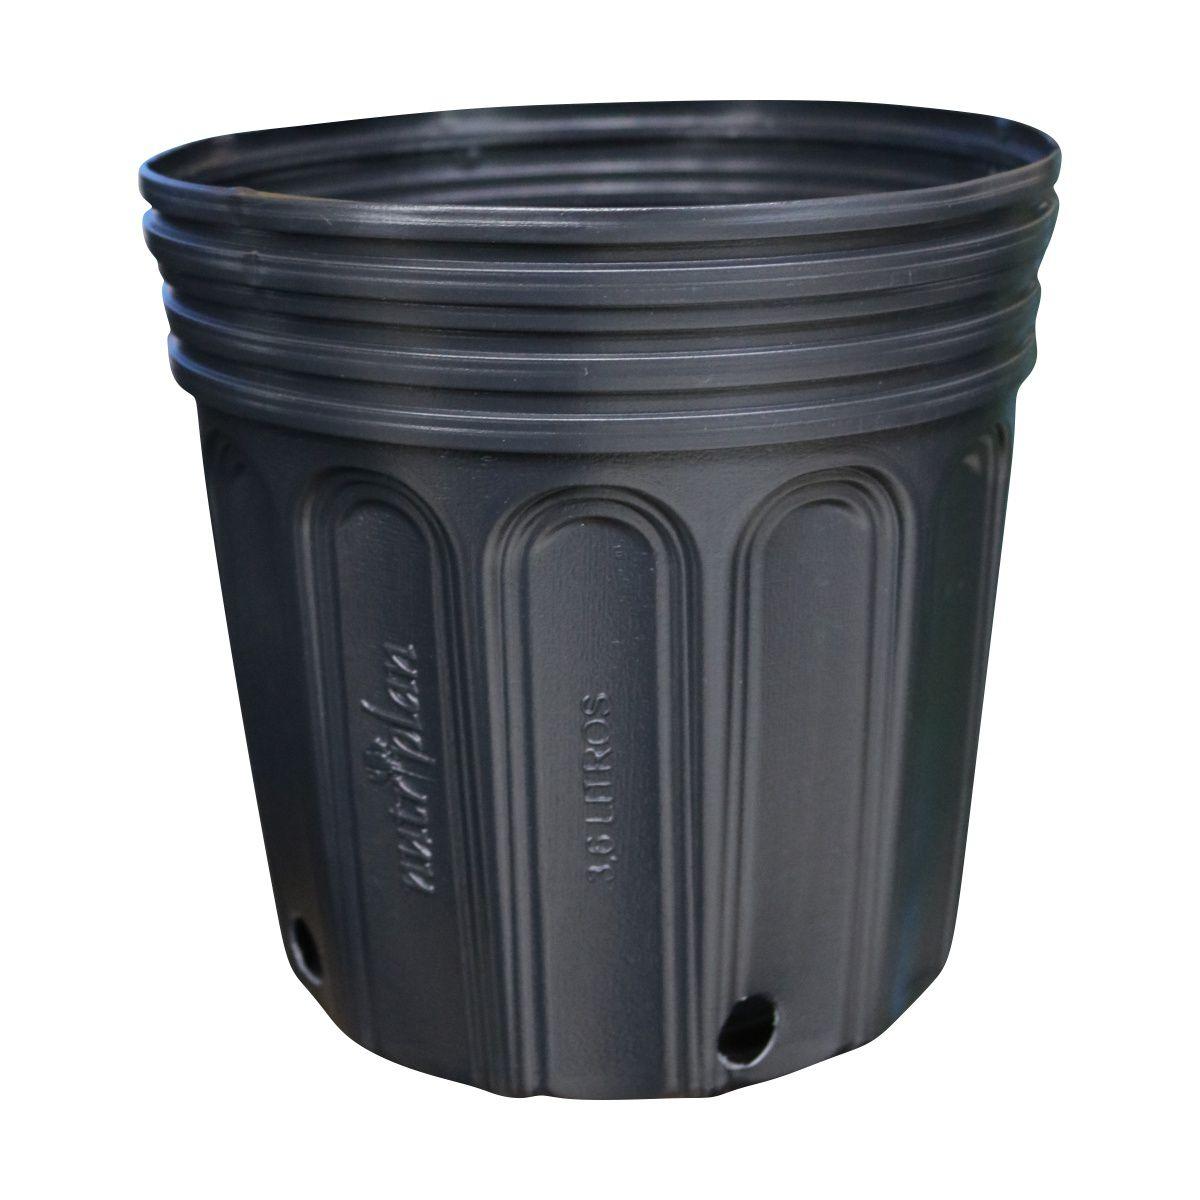 Vaso (embalagem) para mudas pote 3,6 Litros